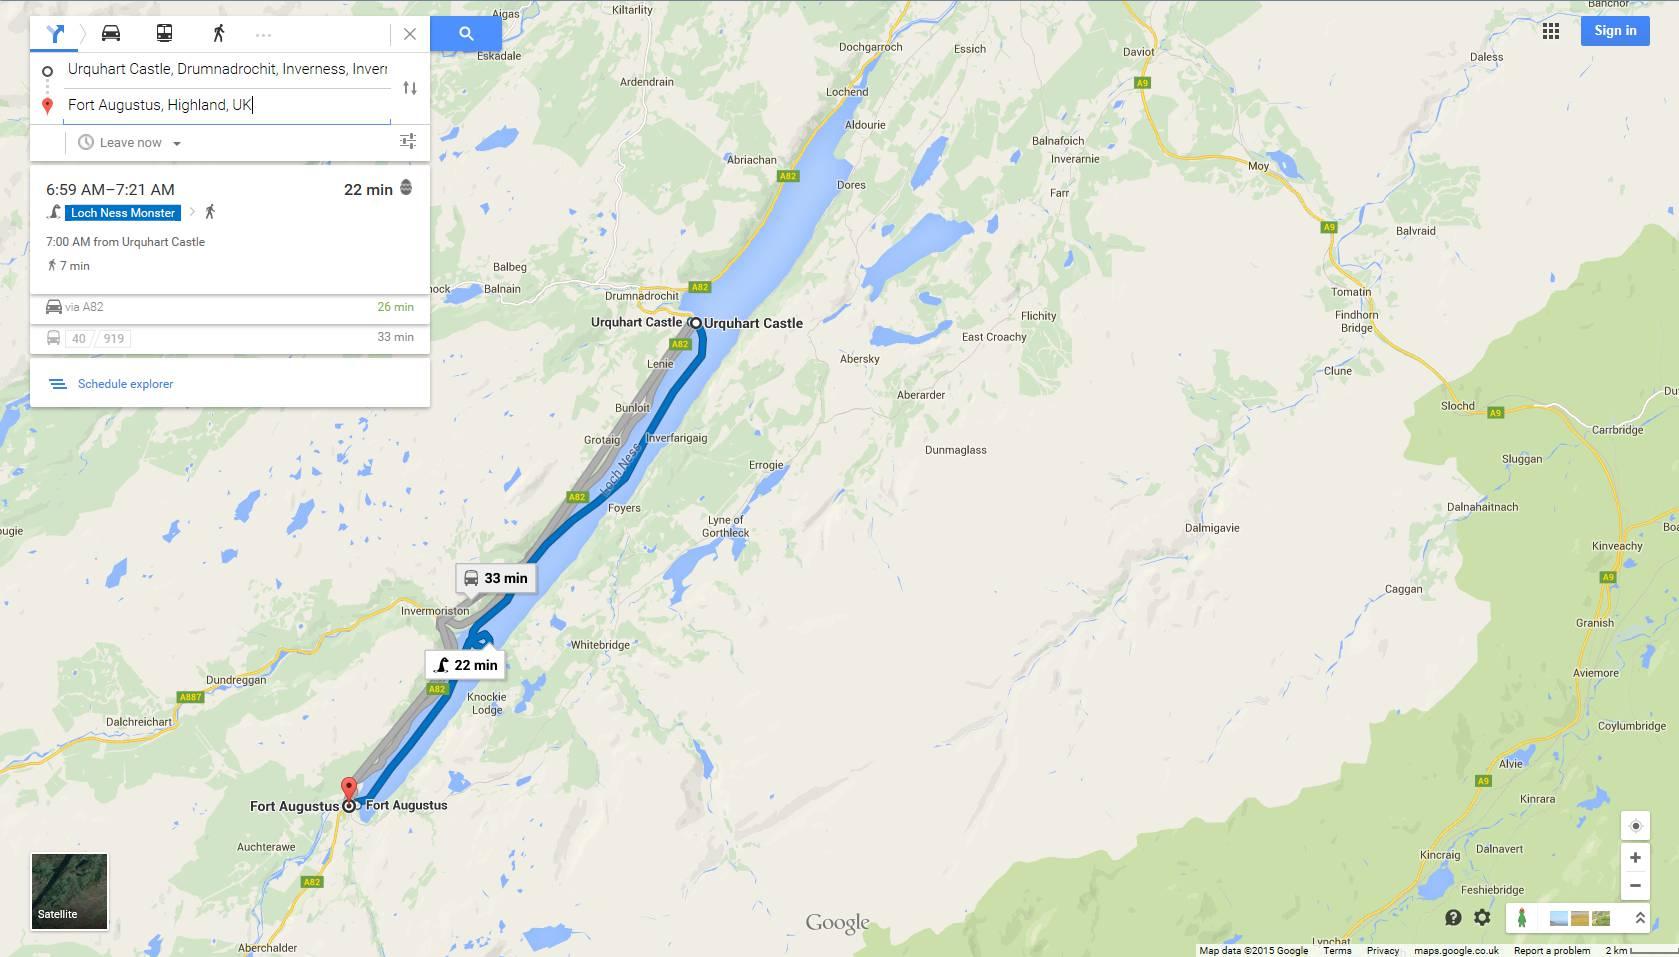 Website] Google Maps Easter Egg: Urquhart Castle -> Fort Augustus By ...